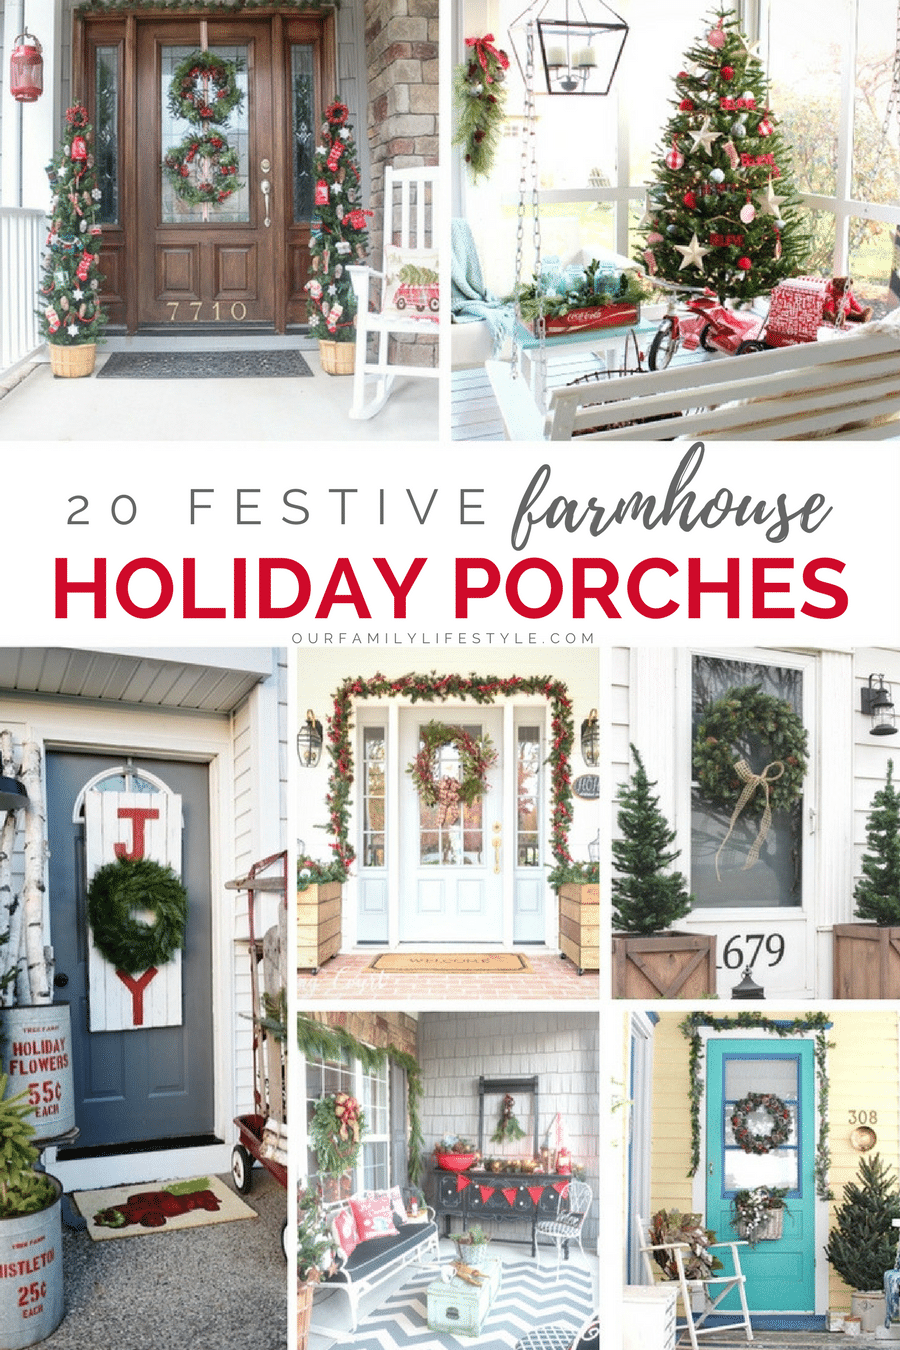 20 Festive Farmhouse Holiday Porches